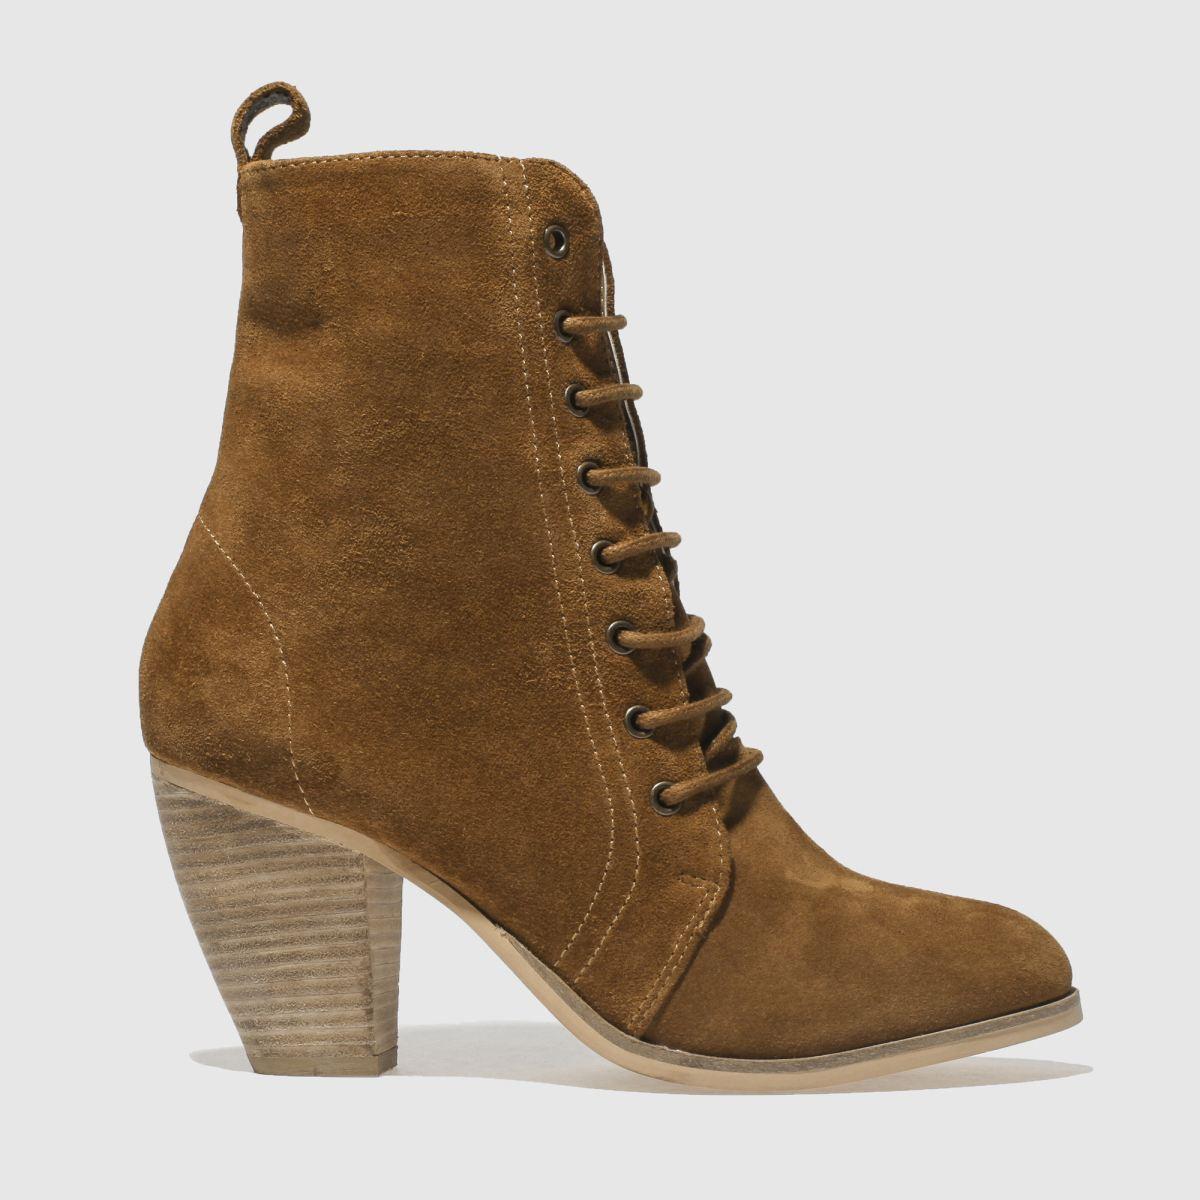 Schuh Tan Prim N Proper Boots